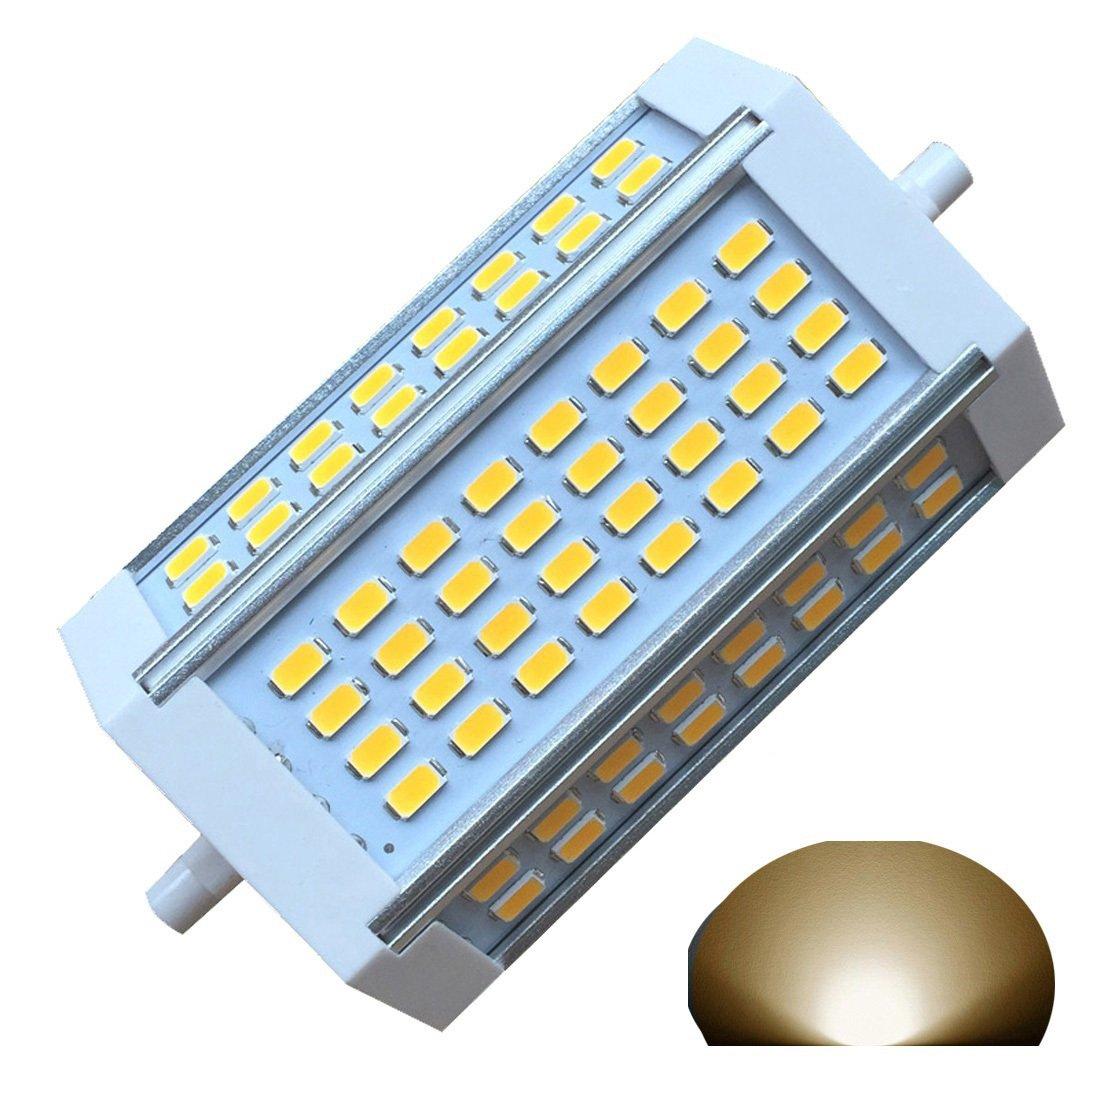 Generic R7s-J118118mm dimmbar Glühbirne 60W Warm Licht 3000K AC220V 3000LM, doppelte Enden J-Floodlight, R7s, 200W, 300W, 400W Halogen-Ersatz (3000K Warmweiß. [Energieklasse A+] 200W 300W QLEE